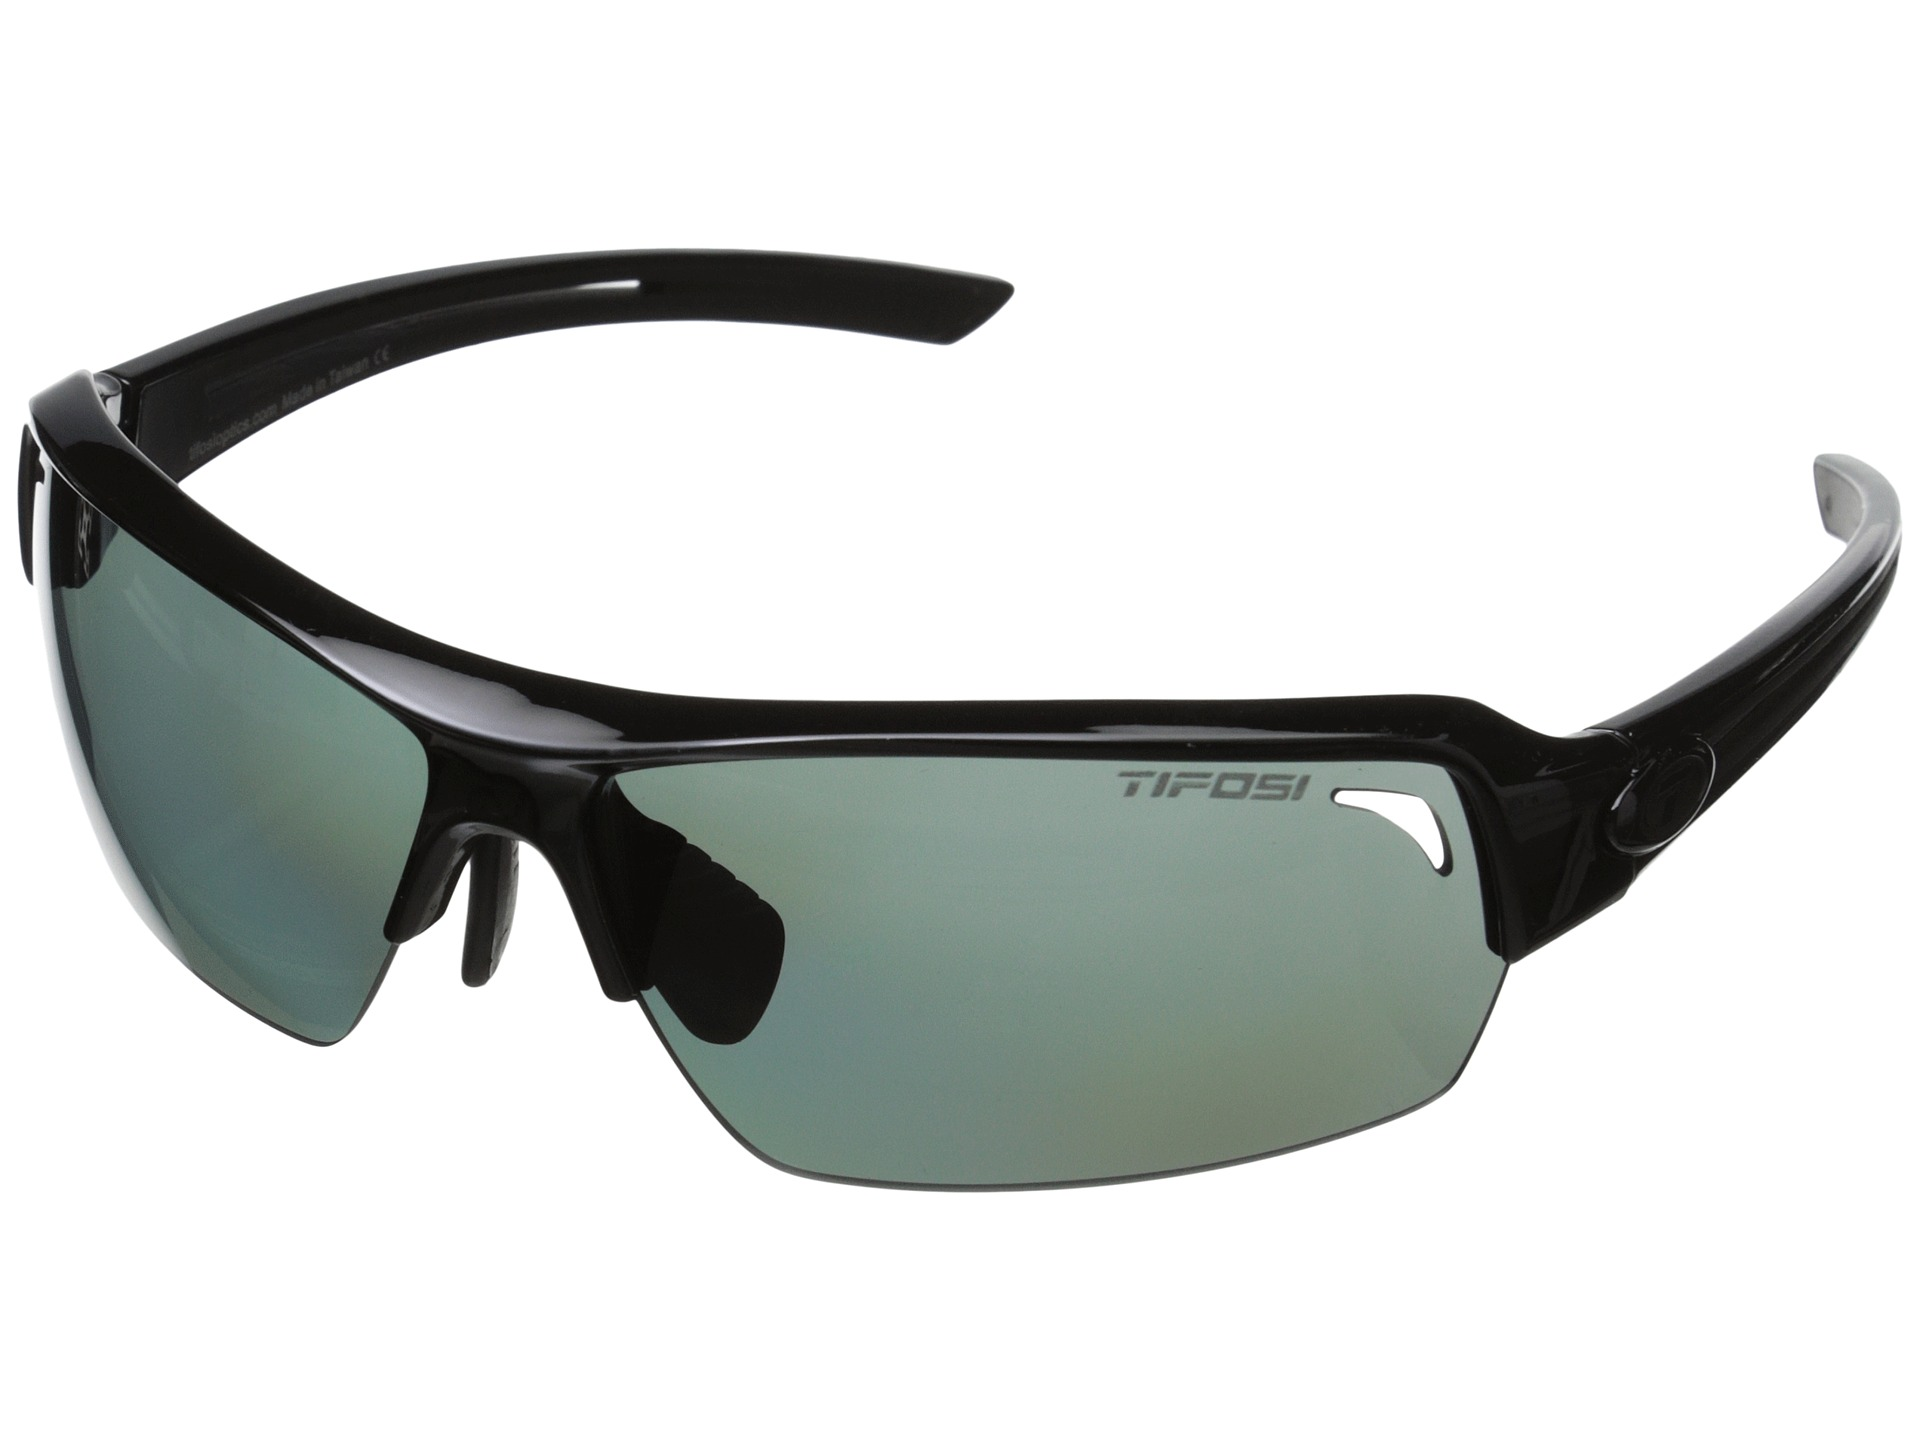 108781b545e Tifosi Polarized Sunglasses For Women